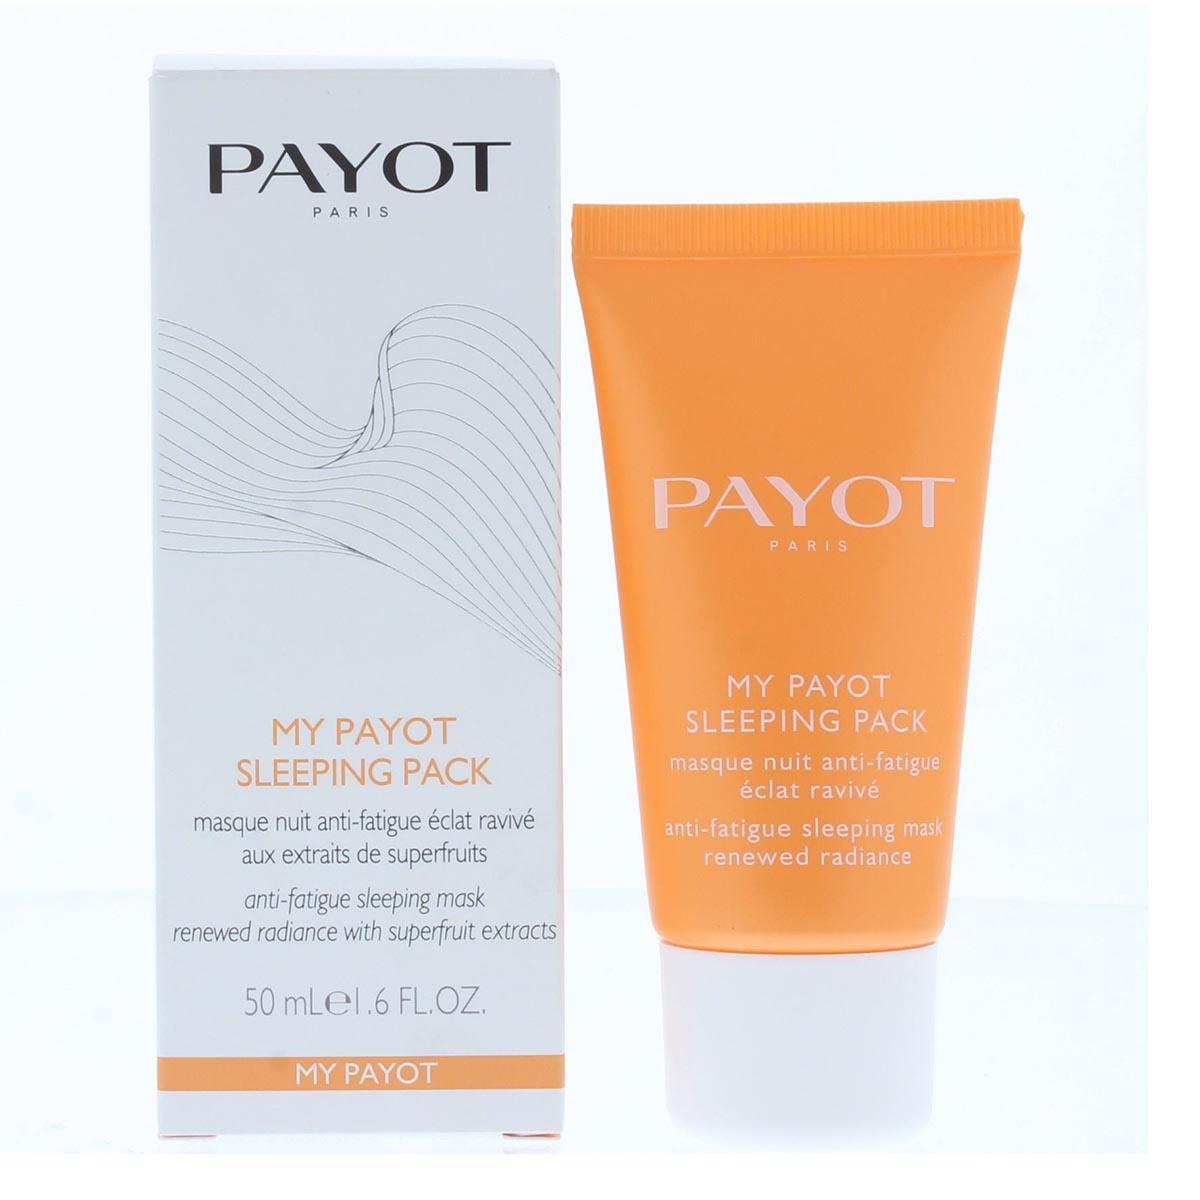 Payot my payot sleeping pack 50ml